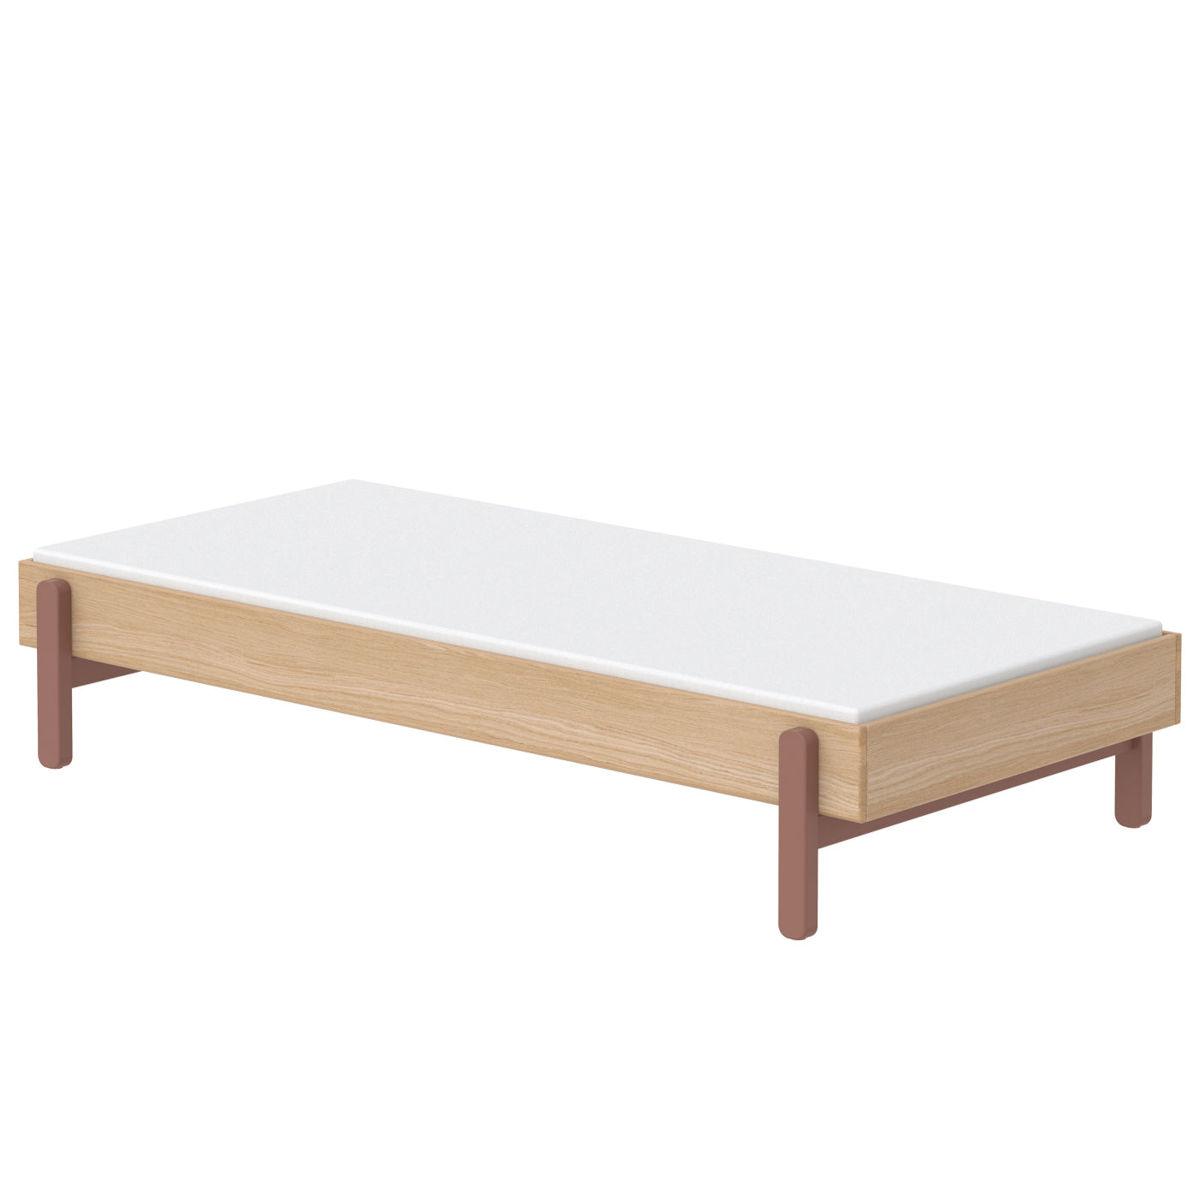 flexa popsicle einzelbett 90x200 cherry 80 24101 33 439. Black Bedroom Furniture Sets. Home Design Ideas